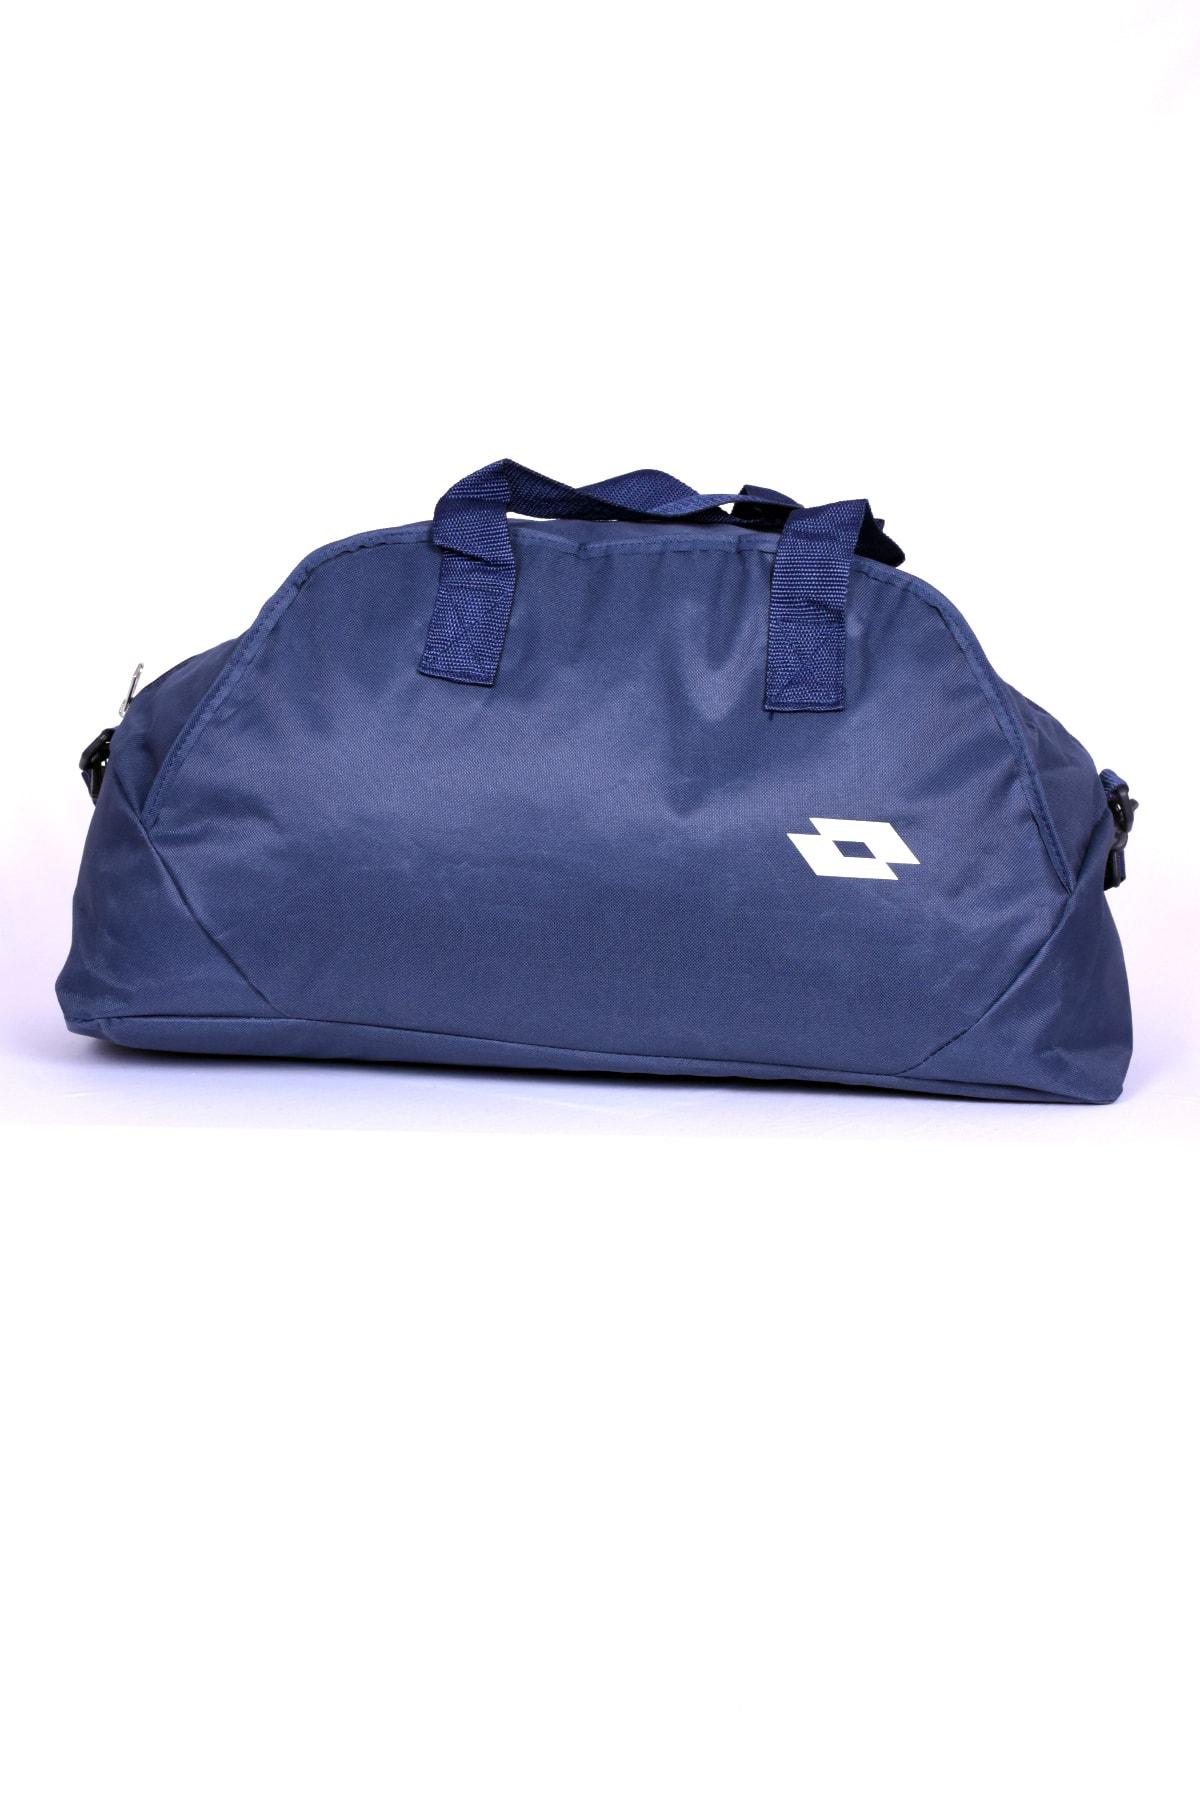 Lotto Unisex Spor Çantası - Bag Sports Pl - R2813